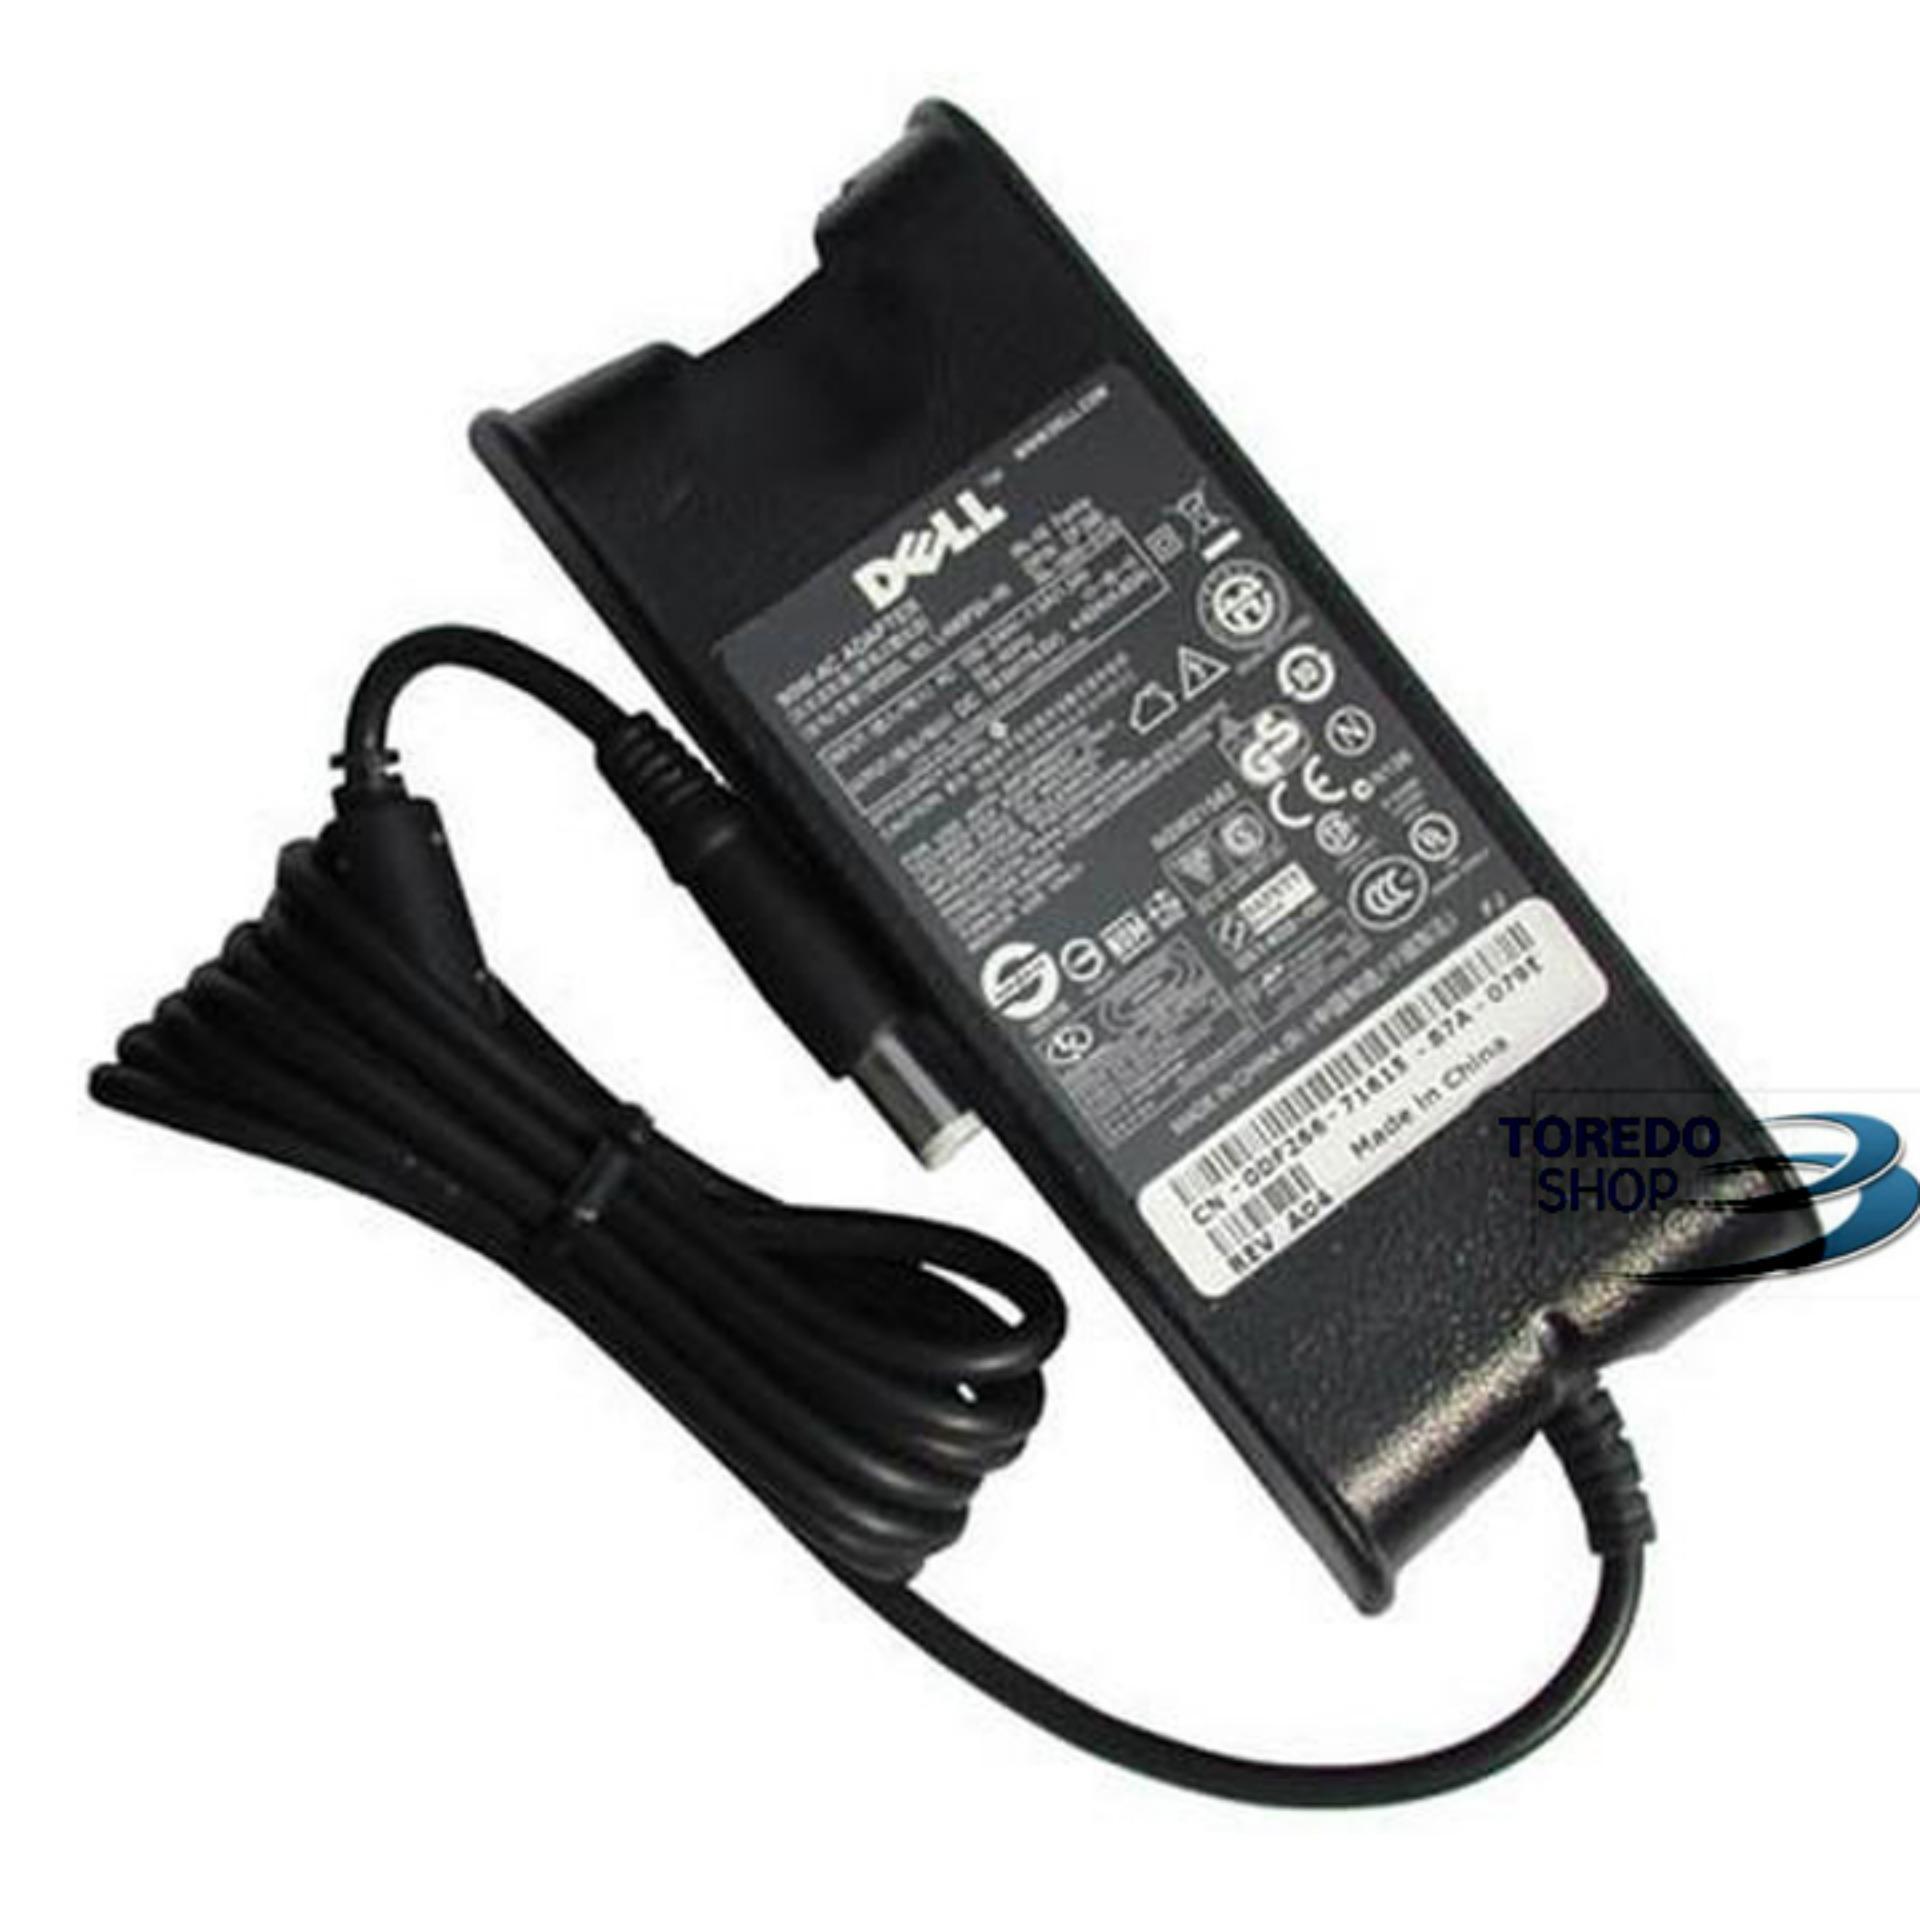 Adaptor / Charger Laptop Dell 19.5V 3.34A (7.4*5.0) PA-12 2 Lubang Ori